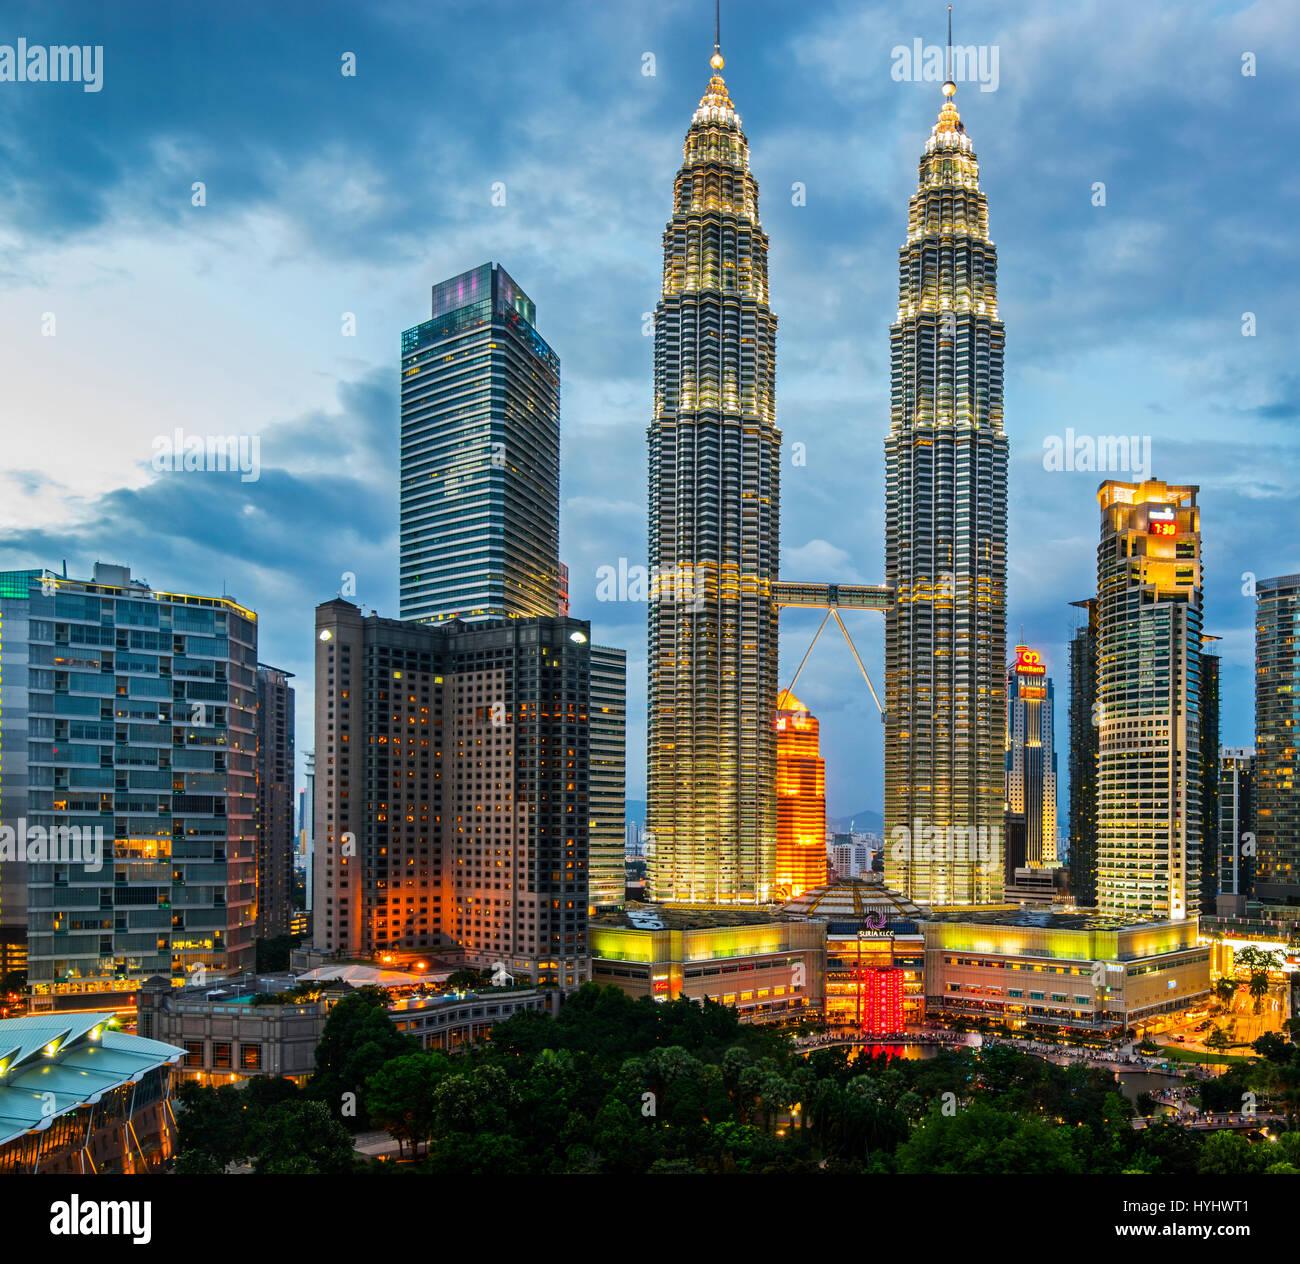 Kuala Lumpur Petronas Twin Towers und City-Center-Übersicht, Malaysia Stockbild